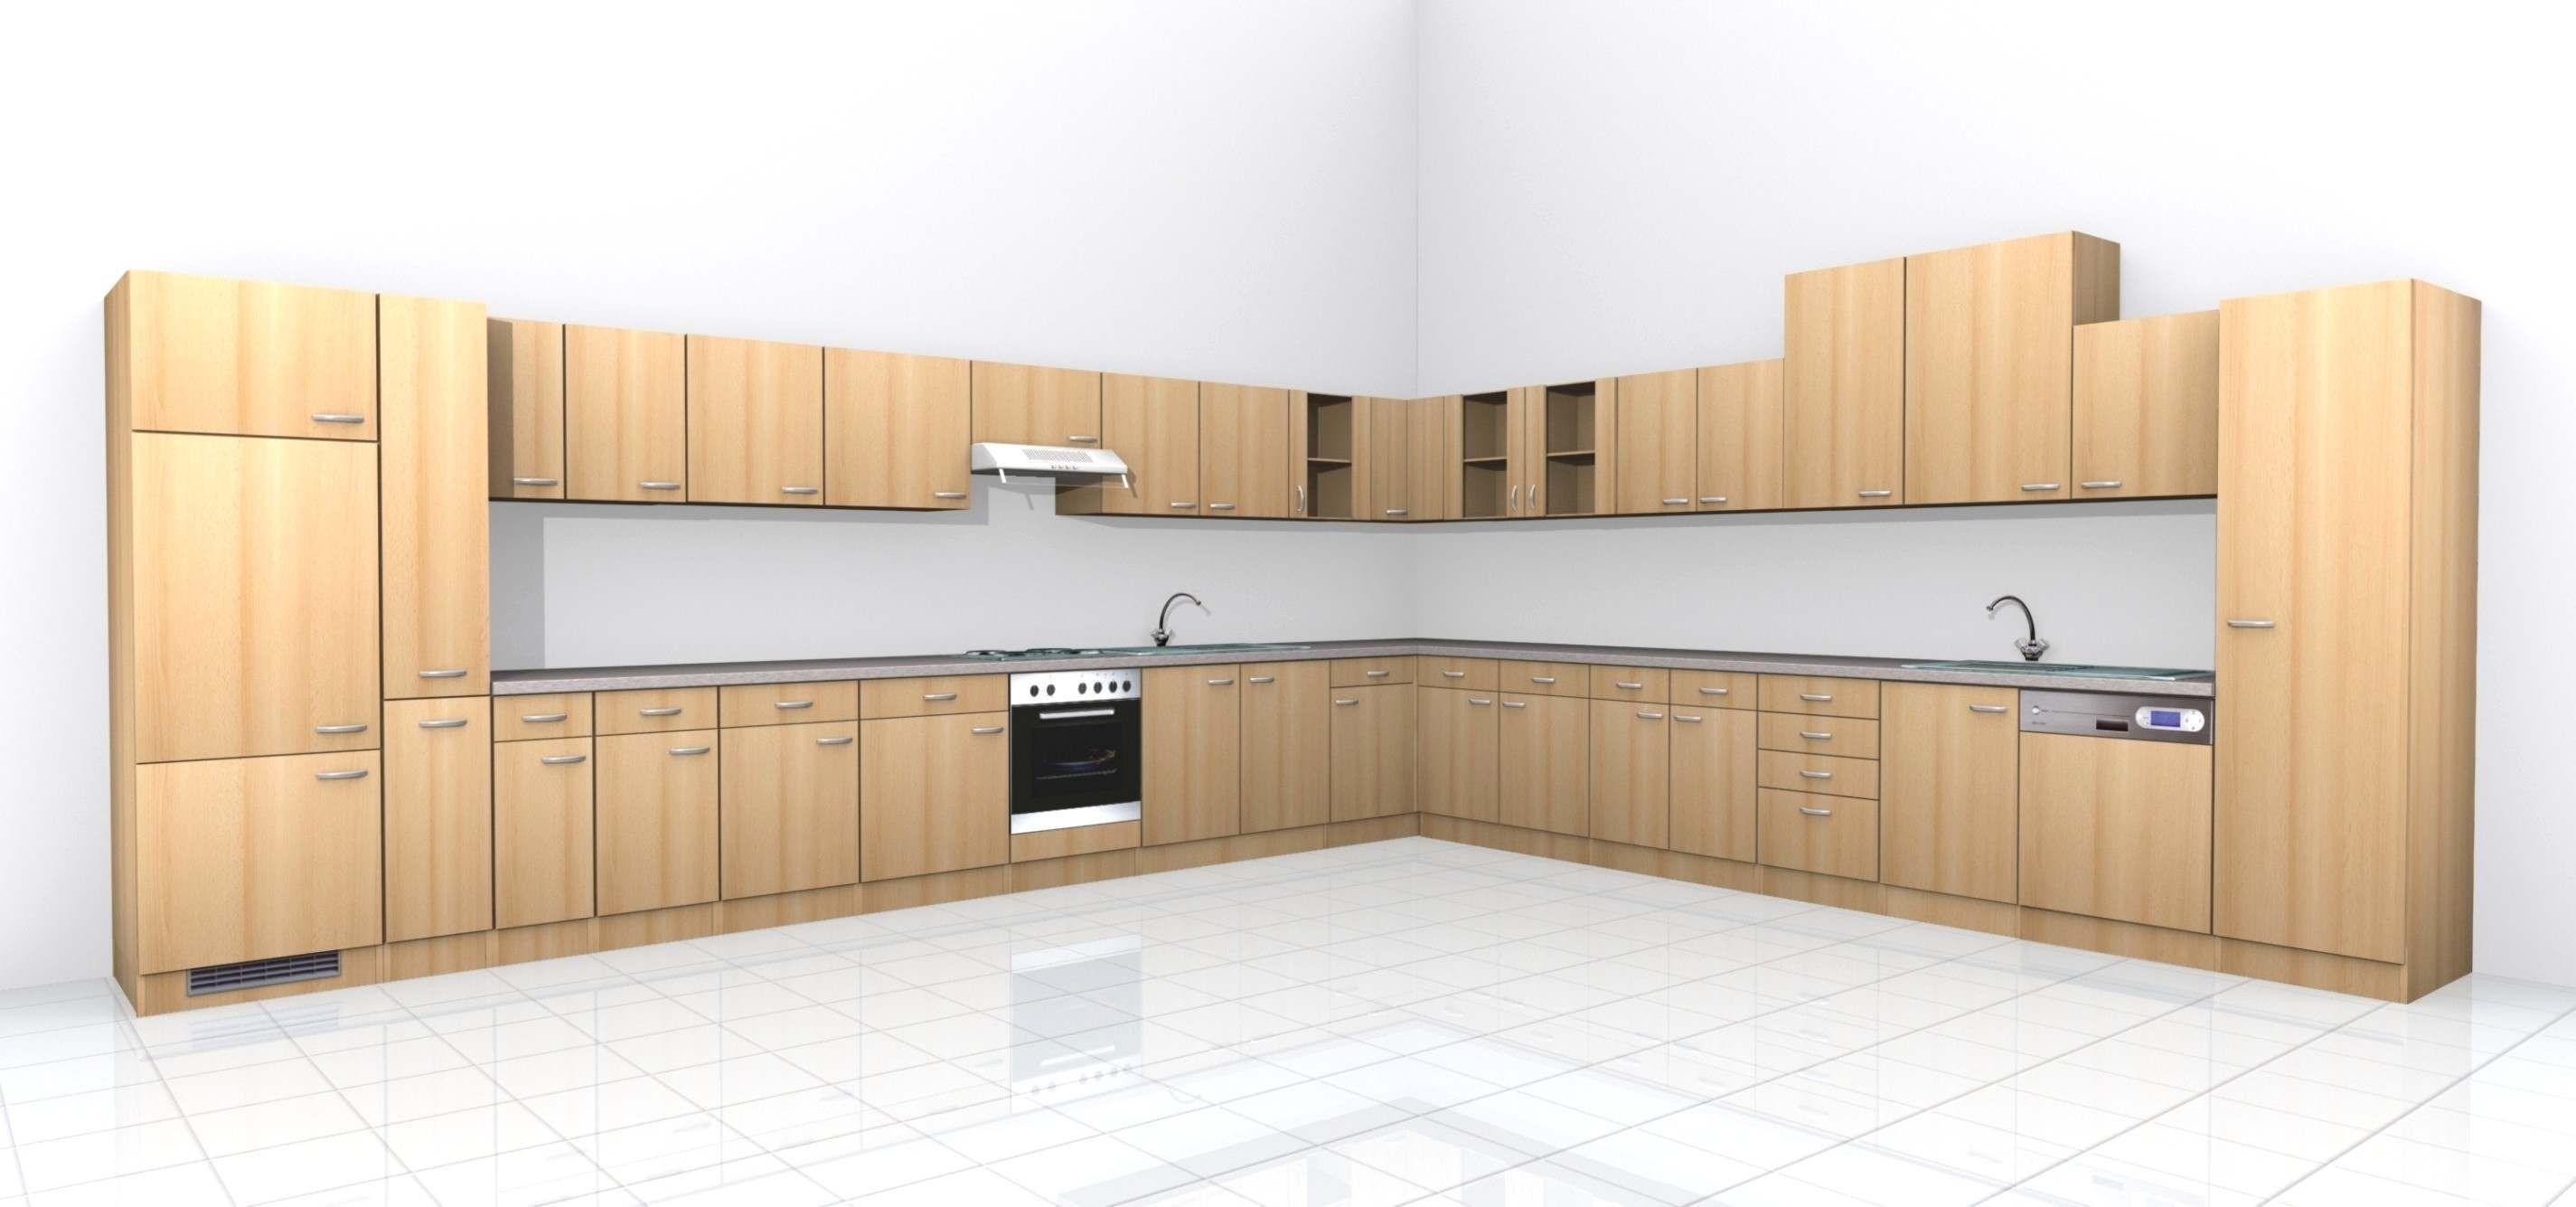 20 Neu Tiefe Arbeitsplatte Kuche Home Living Room Carpet Room Divider